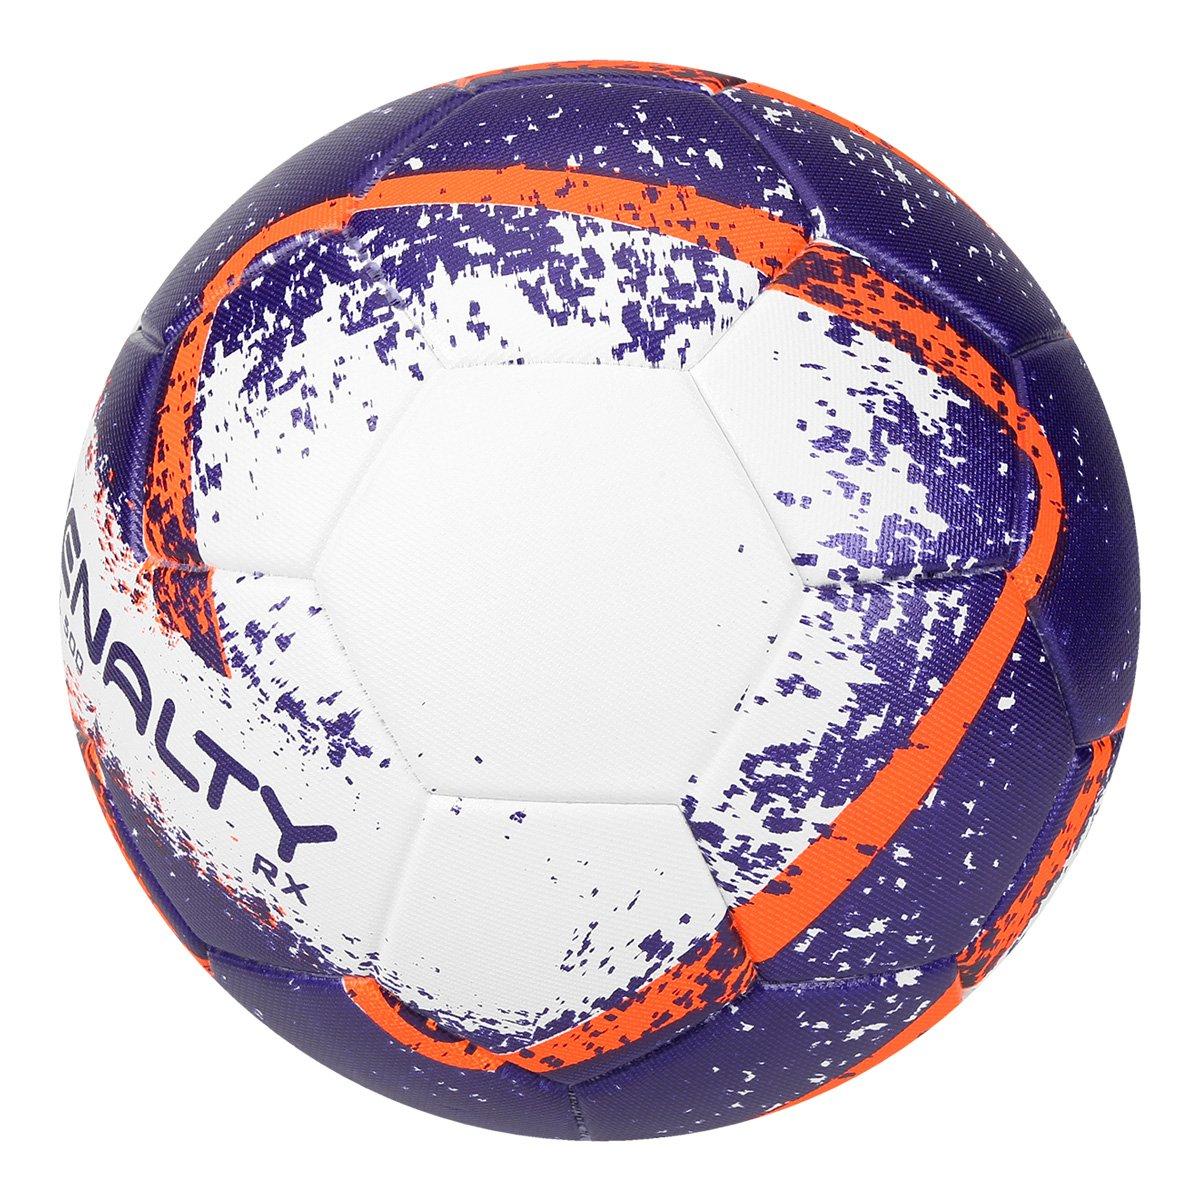 59464fc92b Bola Futsal Penalty RX 500 R2 Fusion VIII - Branco e Laranja ...